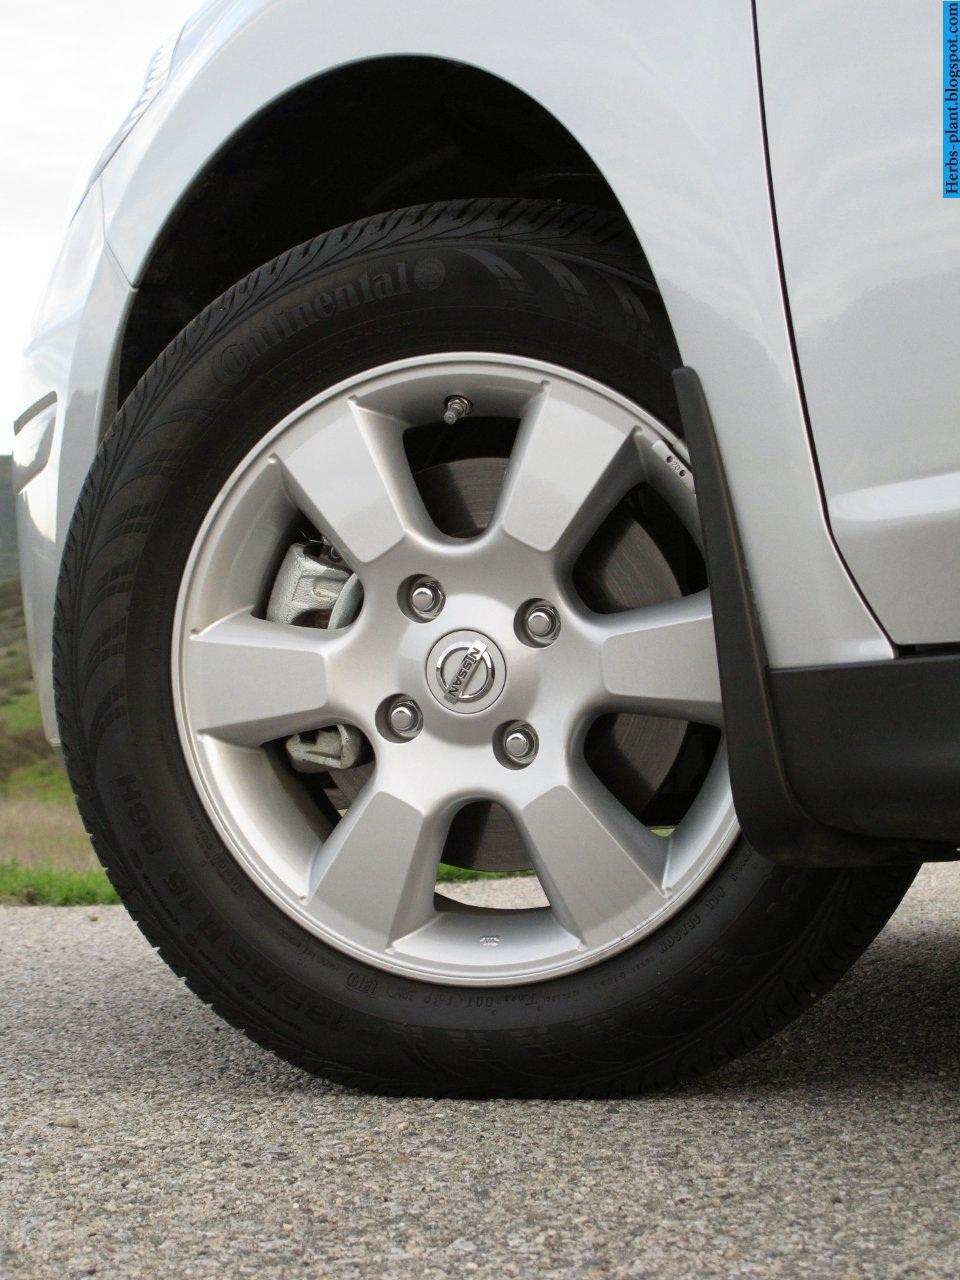 Nissan versa car 2013 tyres/wheels - صور اطارات سيارة نيسان فيرسا 2013